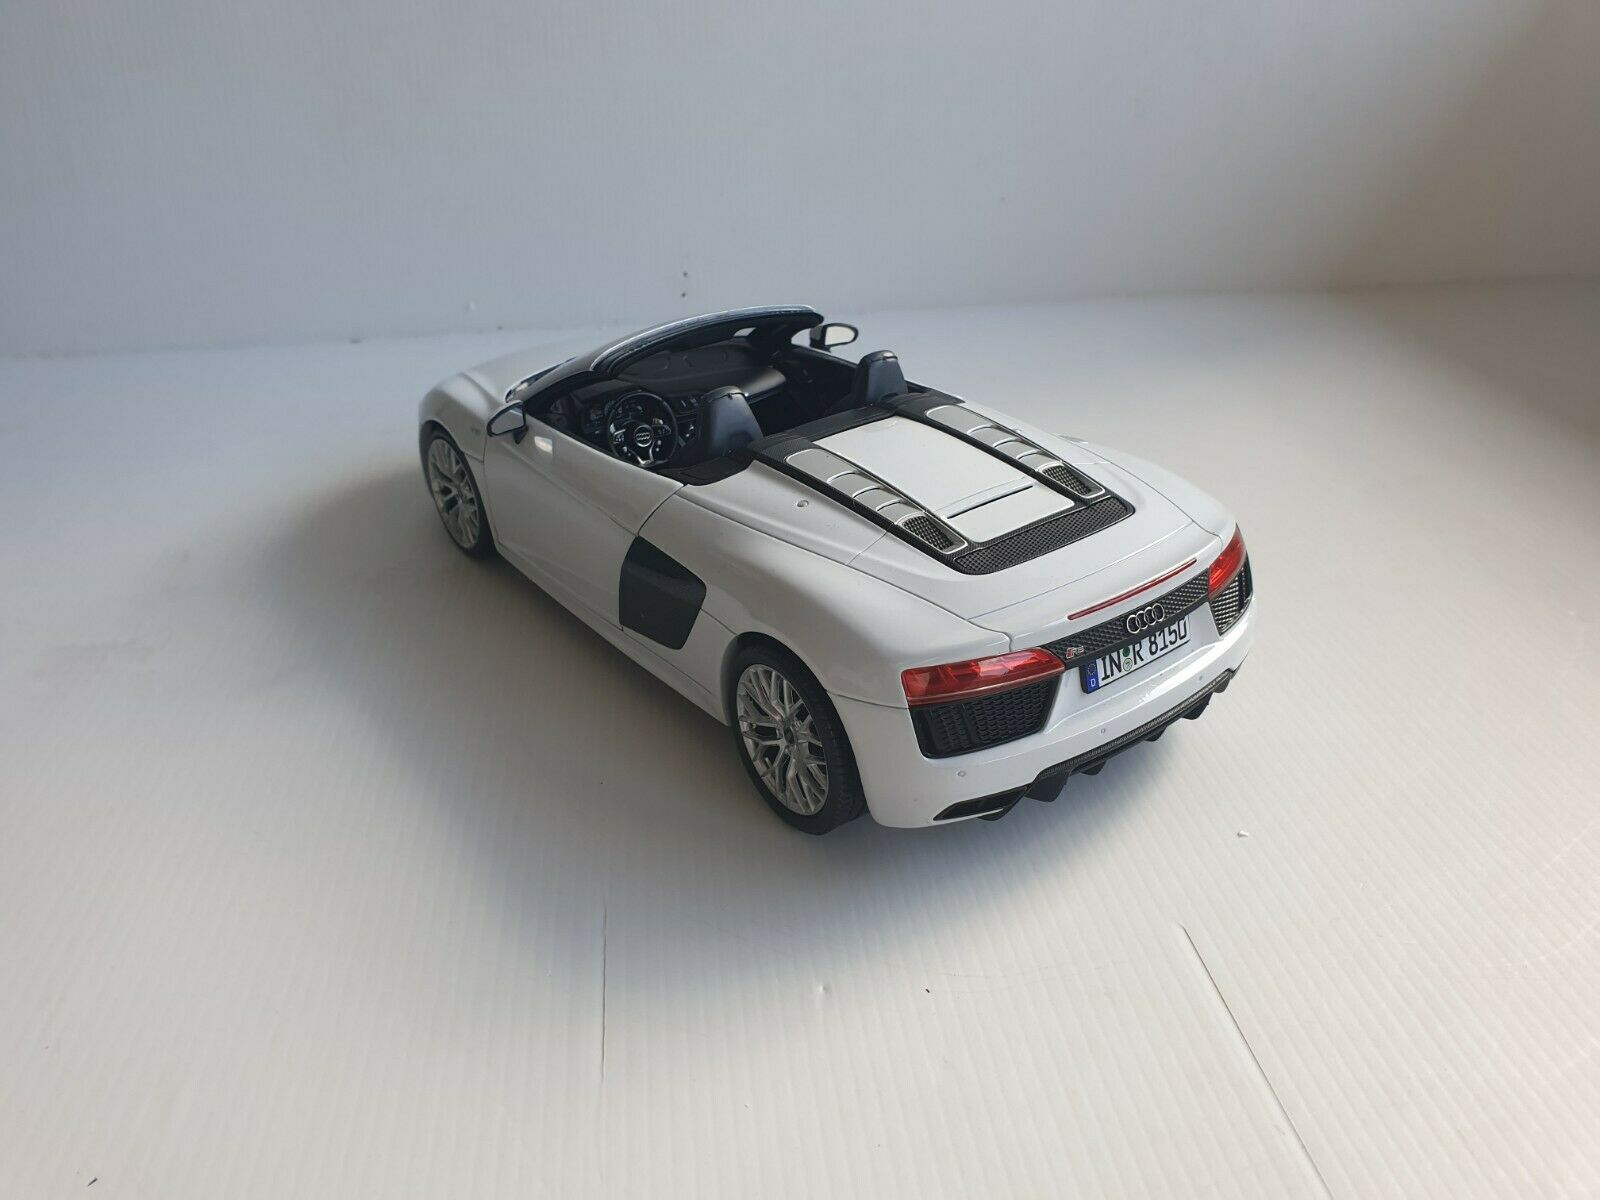 entrega gratis Audi R8 Spyder V10 Suzukagris gris - - - 5011618551 1 18 Iscale  caliente